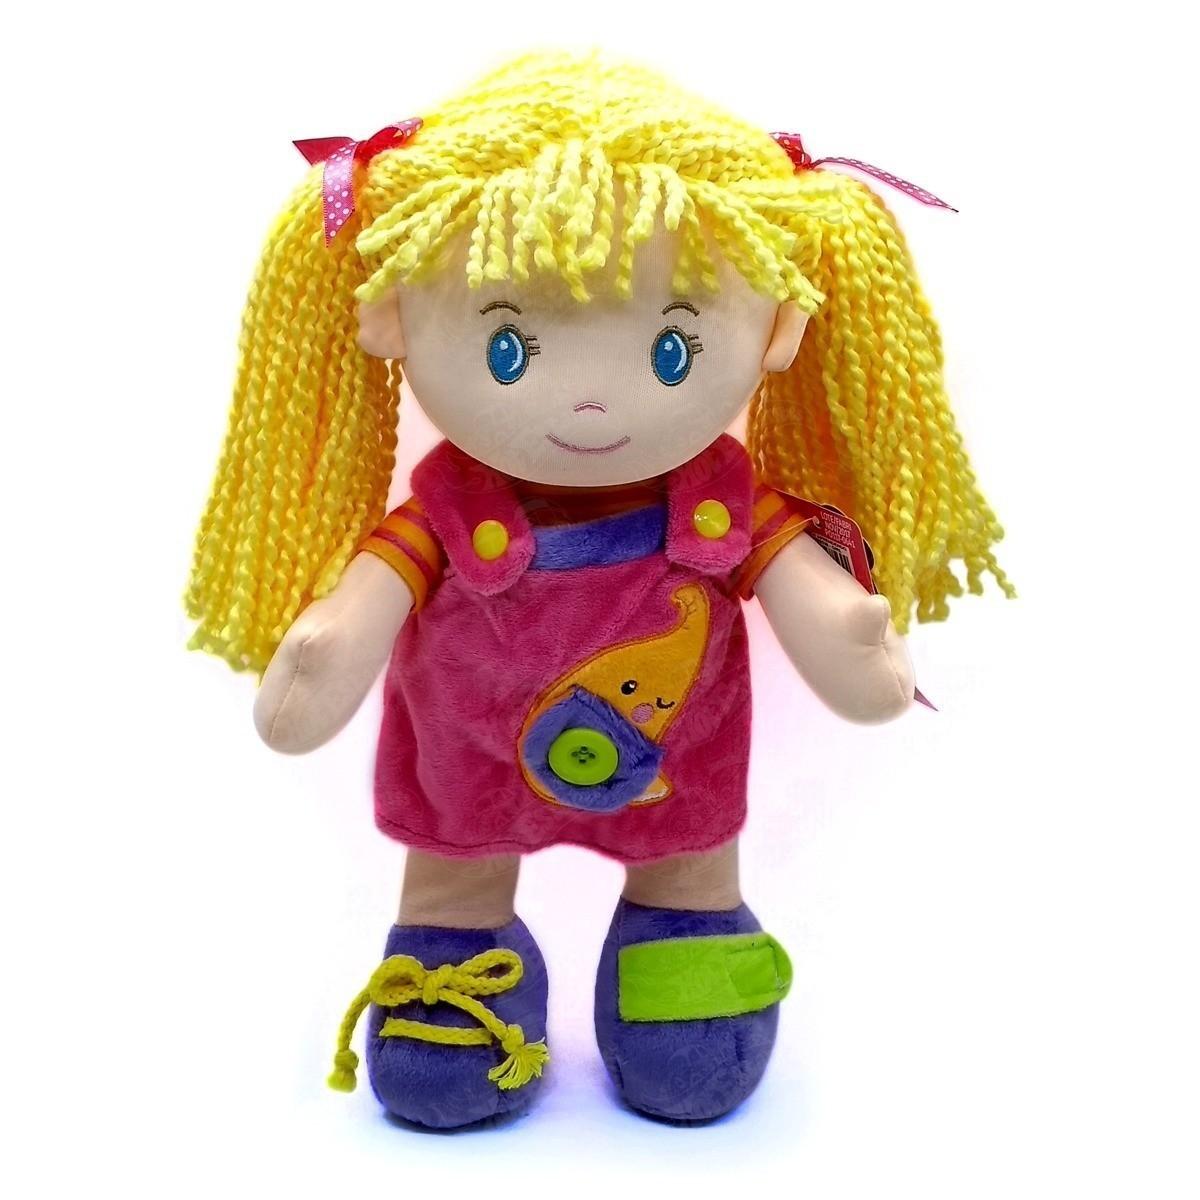 Boneca de Pano Aprendendo a Vestir Girl